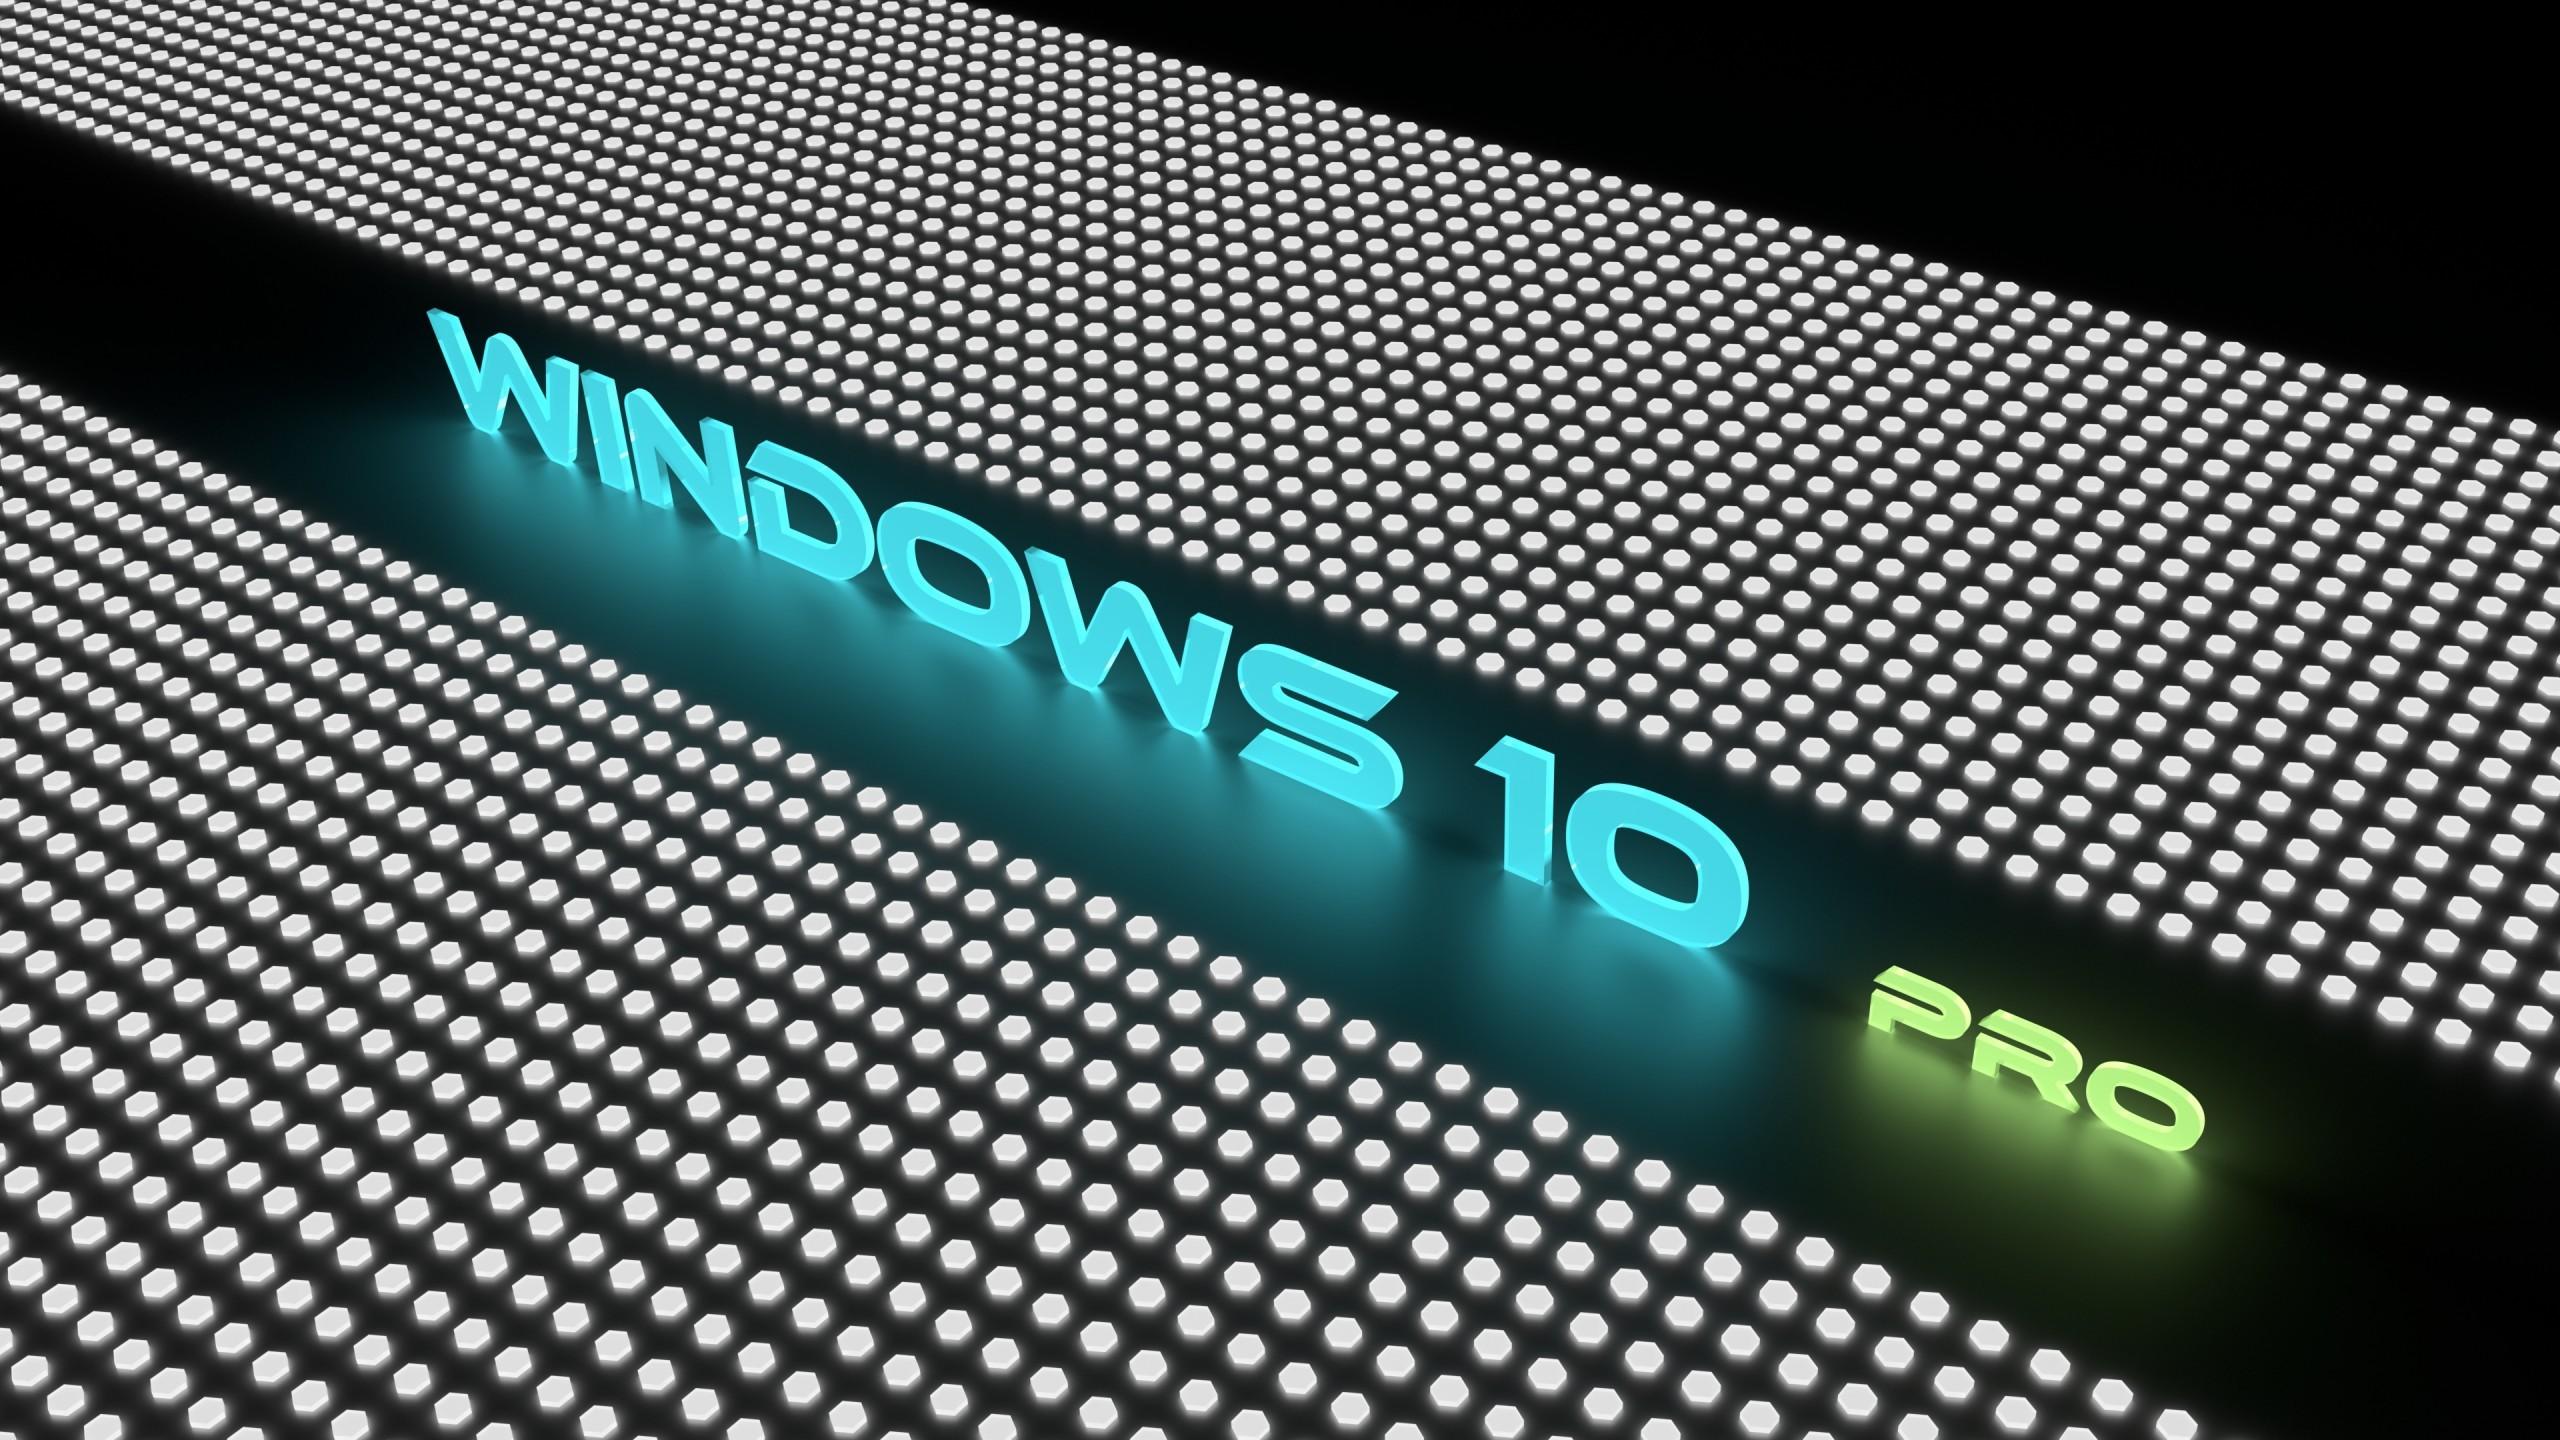 Technology / Windows 10 Pro Wallpaper